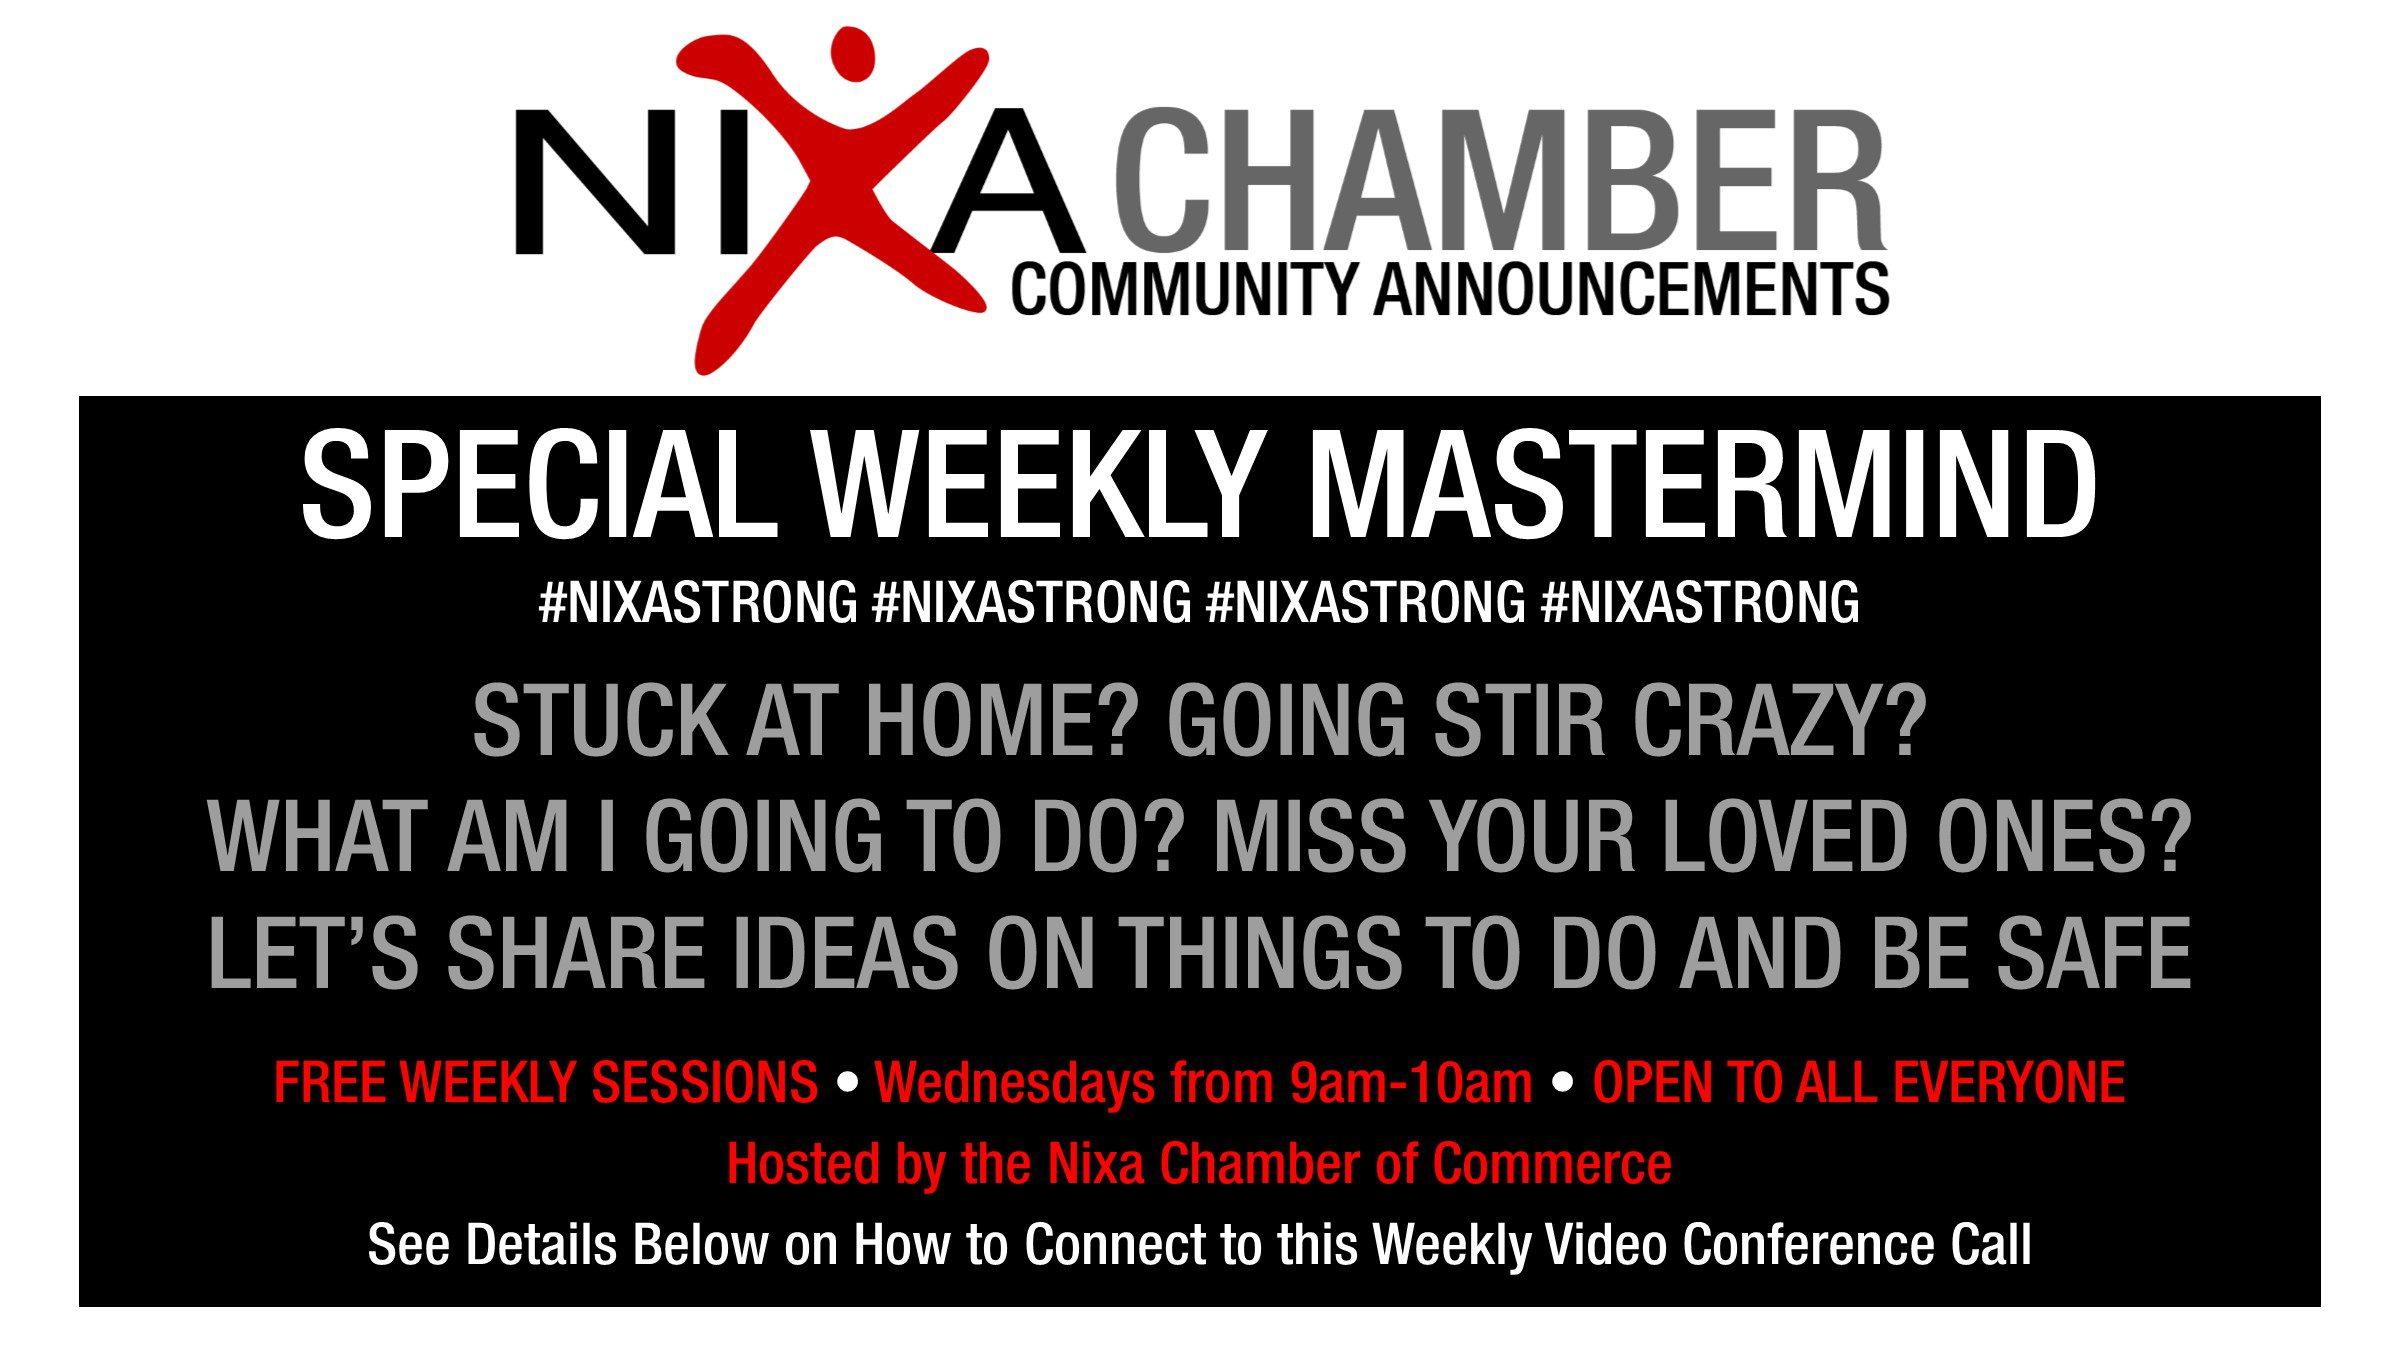 Special Weekly Mastermind